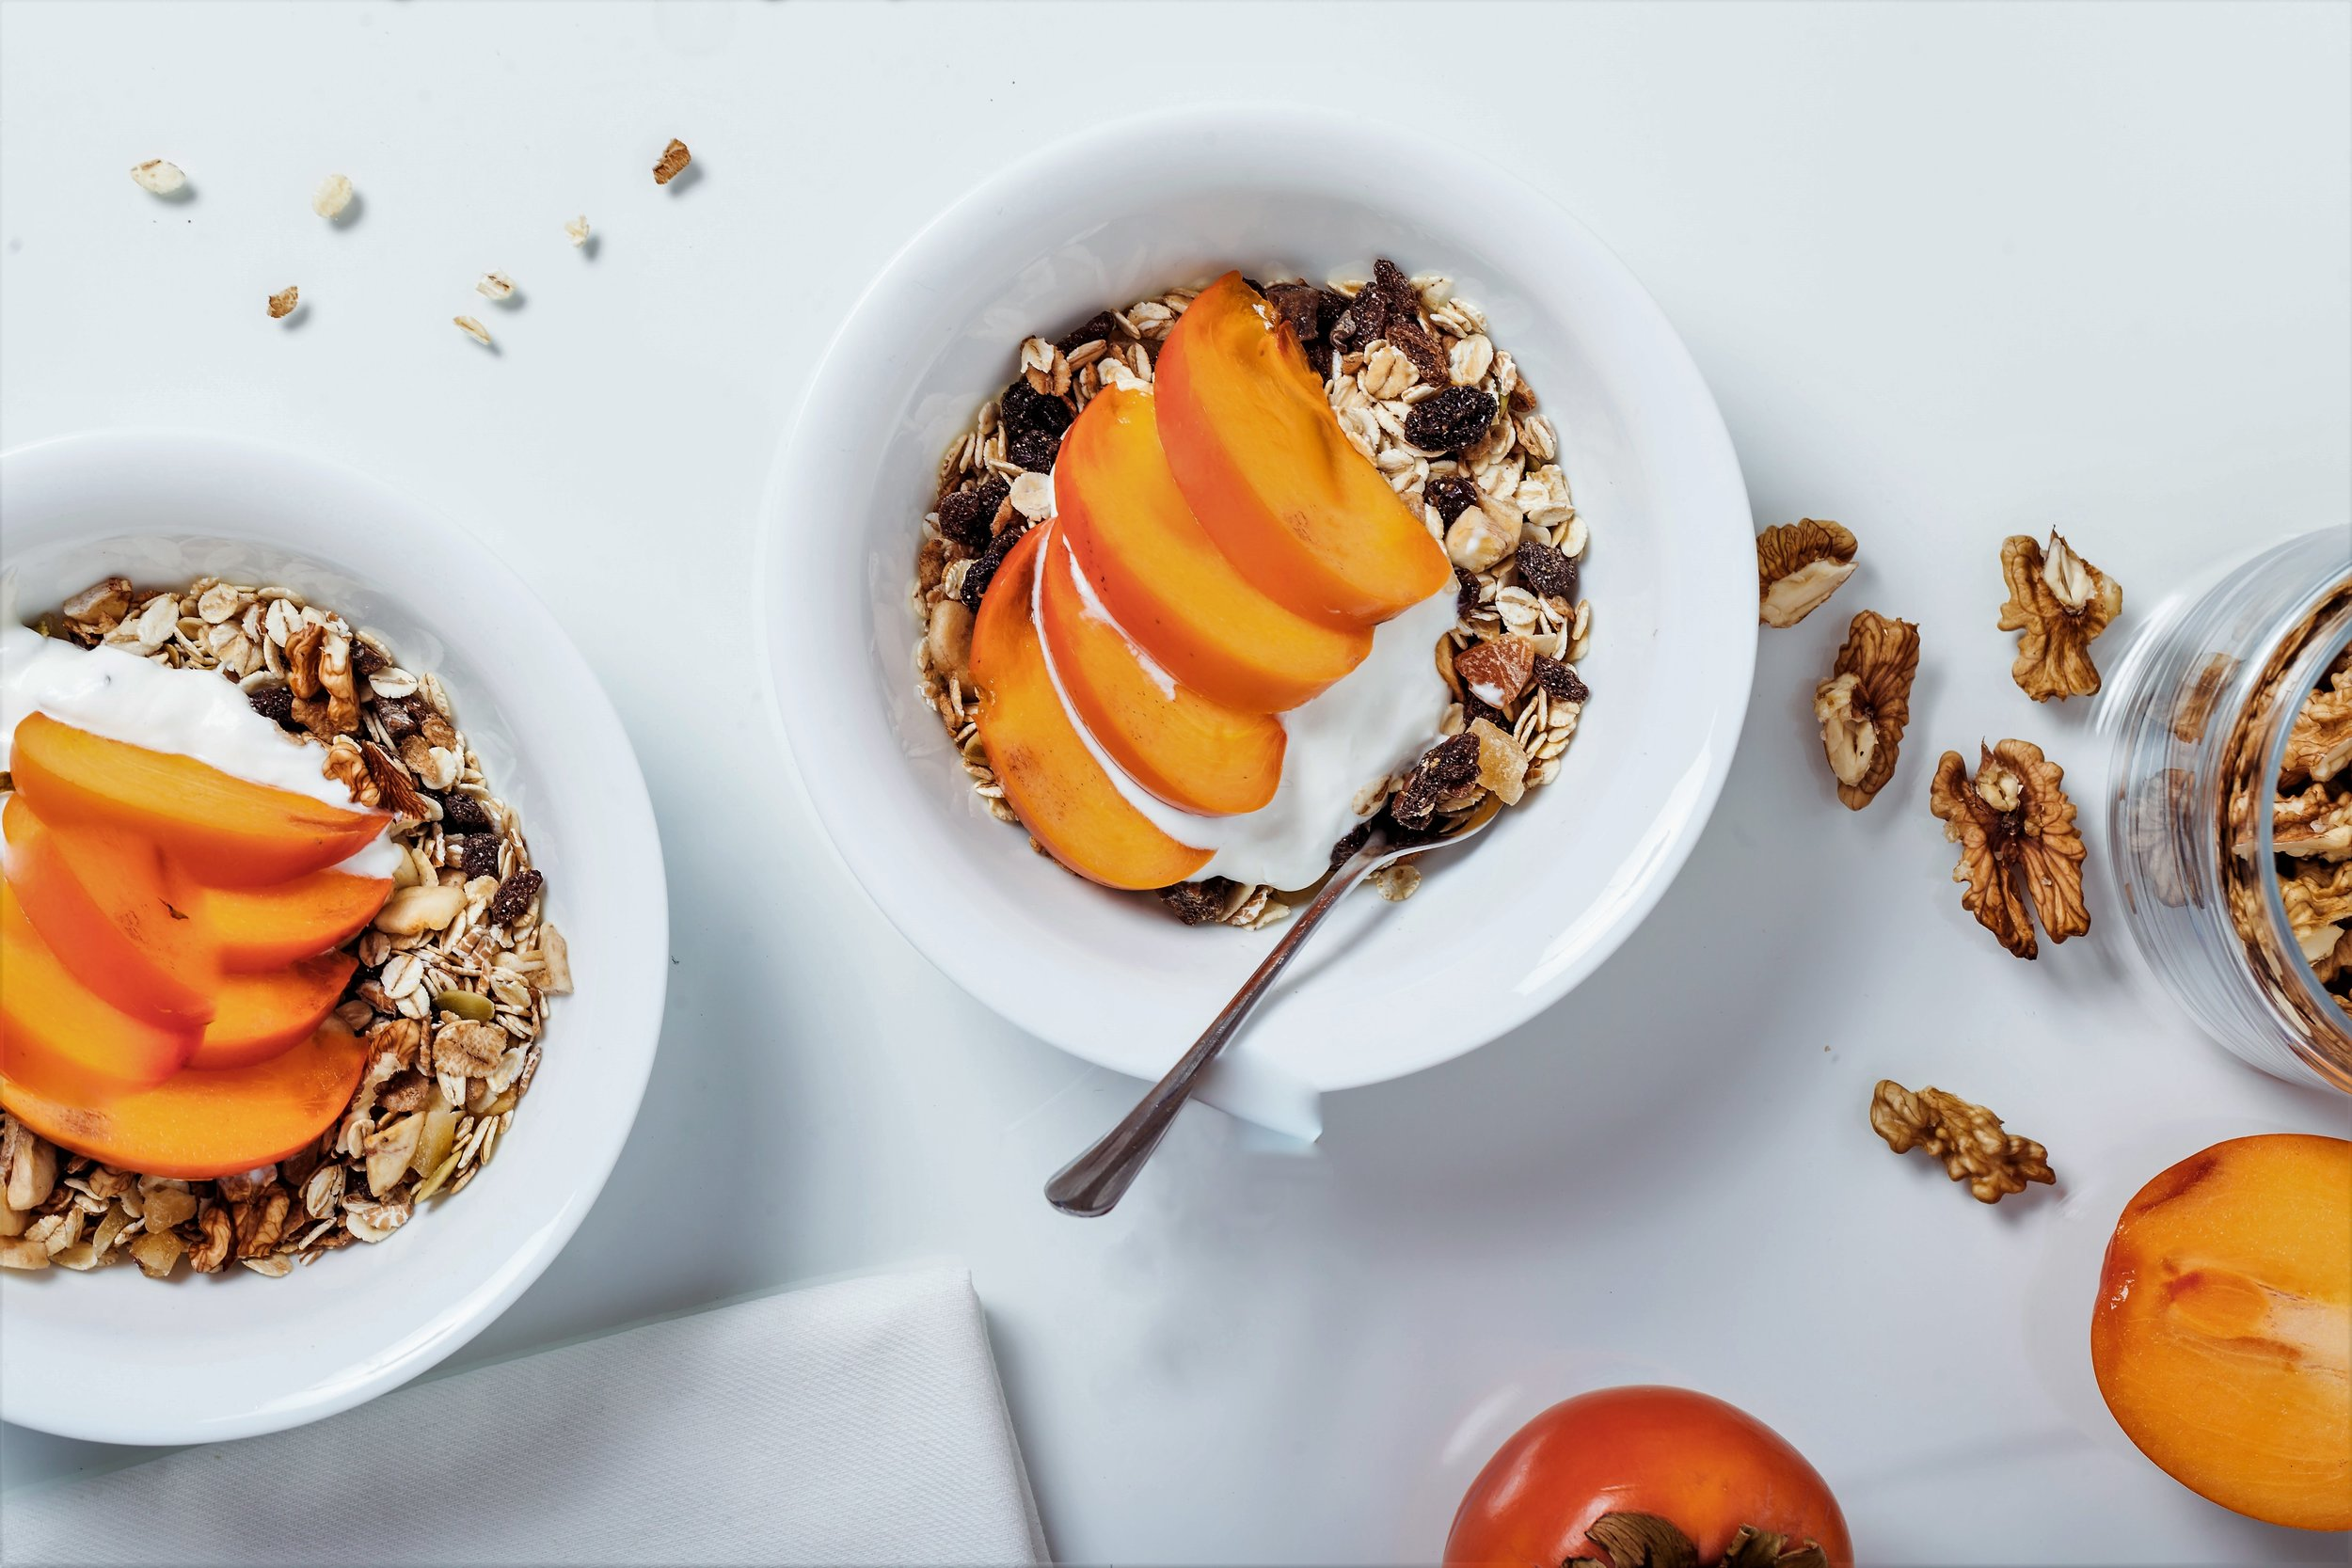 oats and fruit.jpg